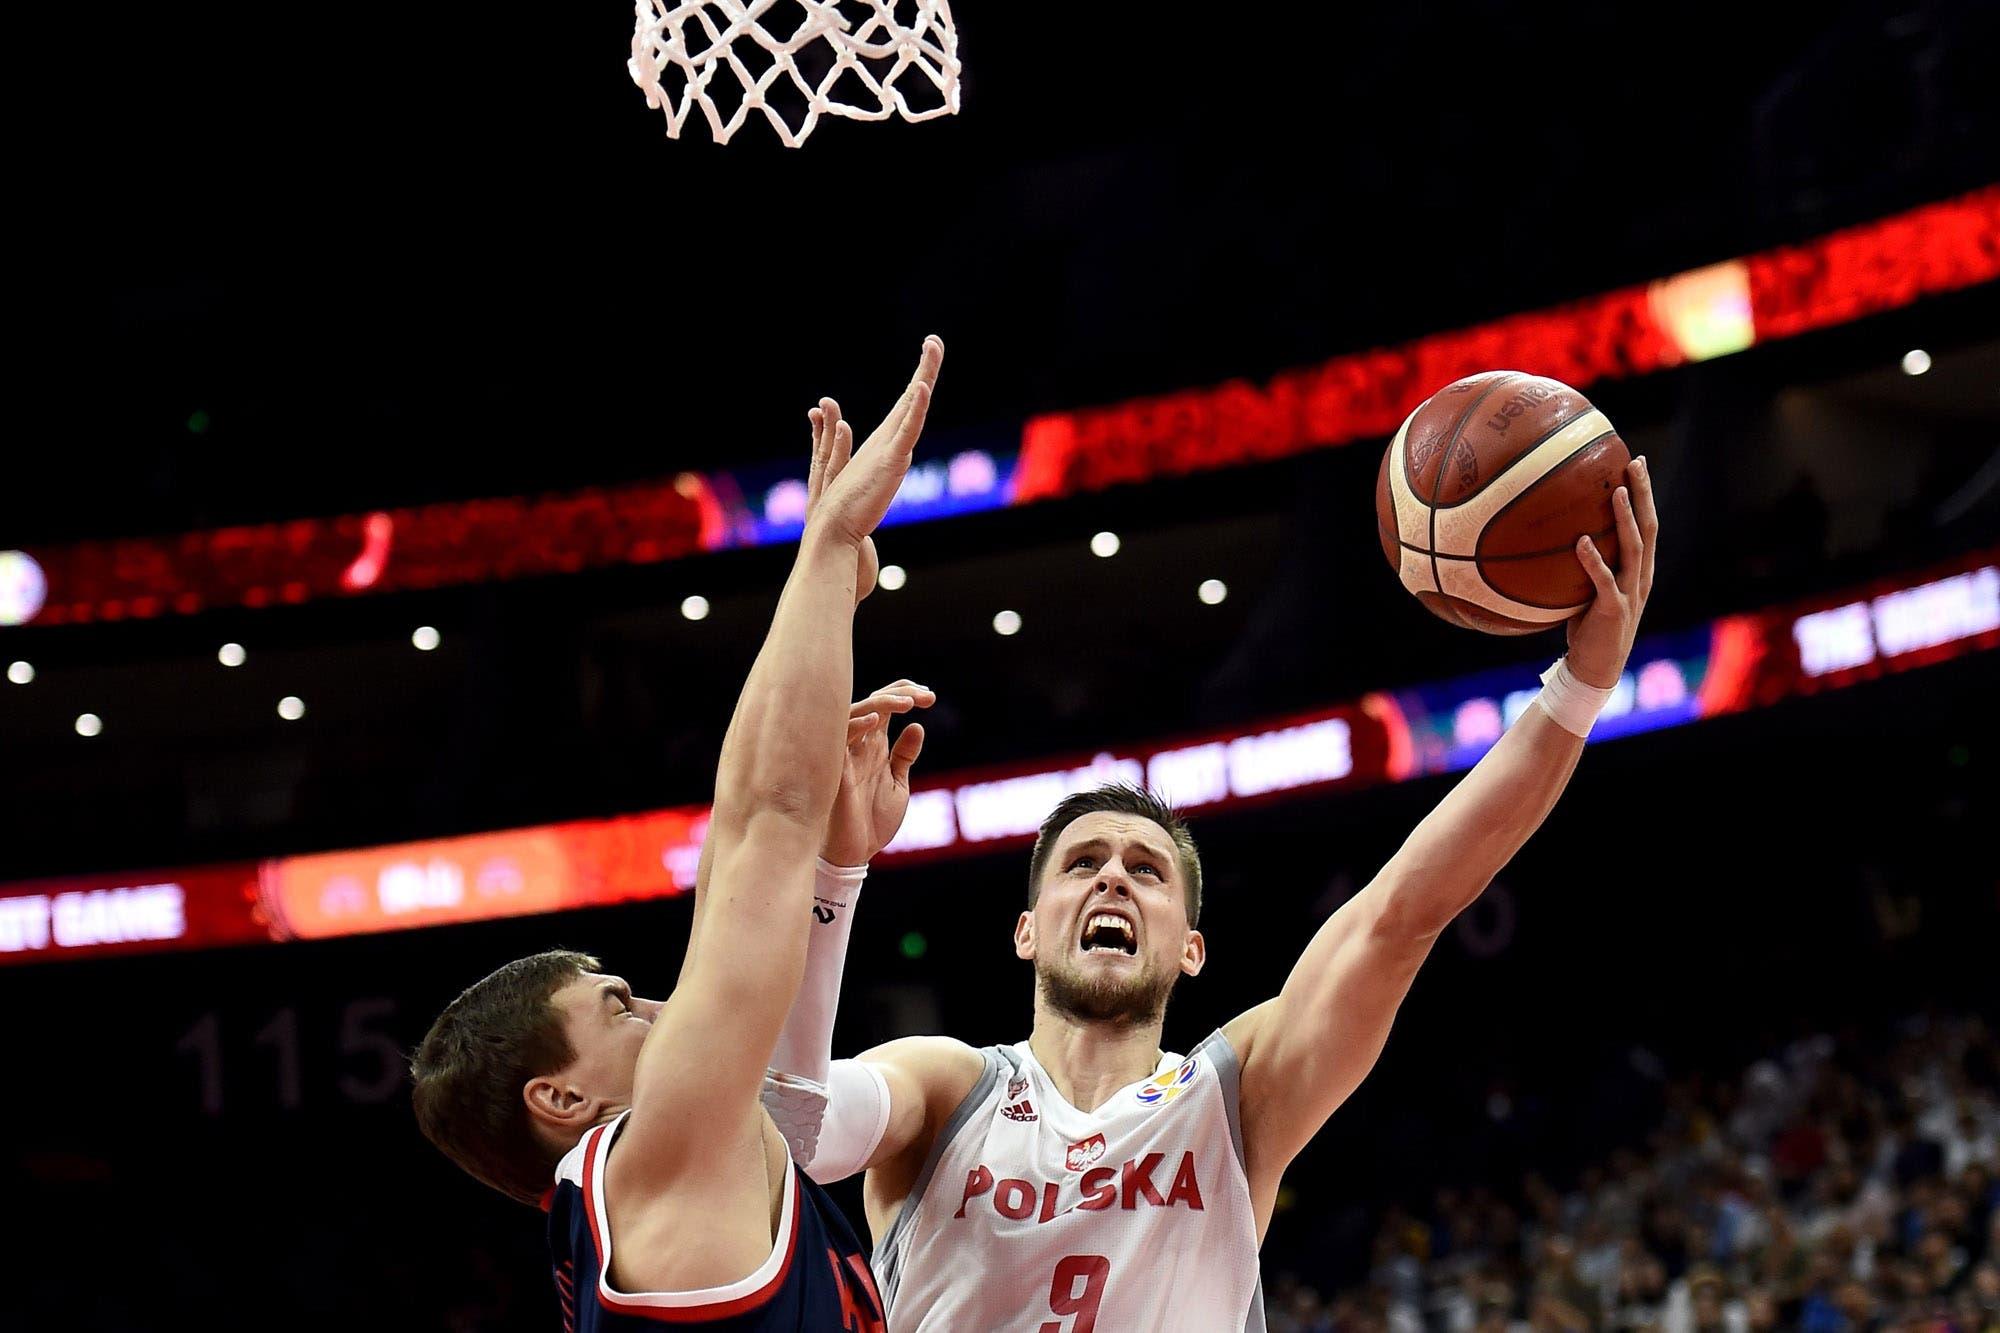 Mundial de básquet: la victoria de Polonia ante Rusia que ayuda a Argentina